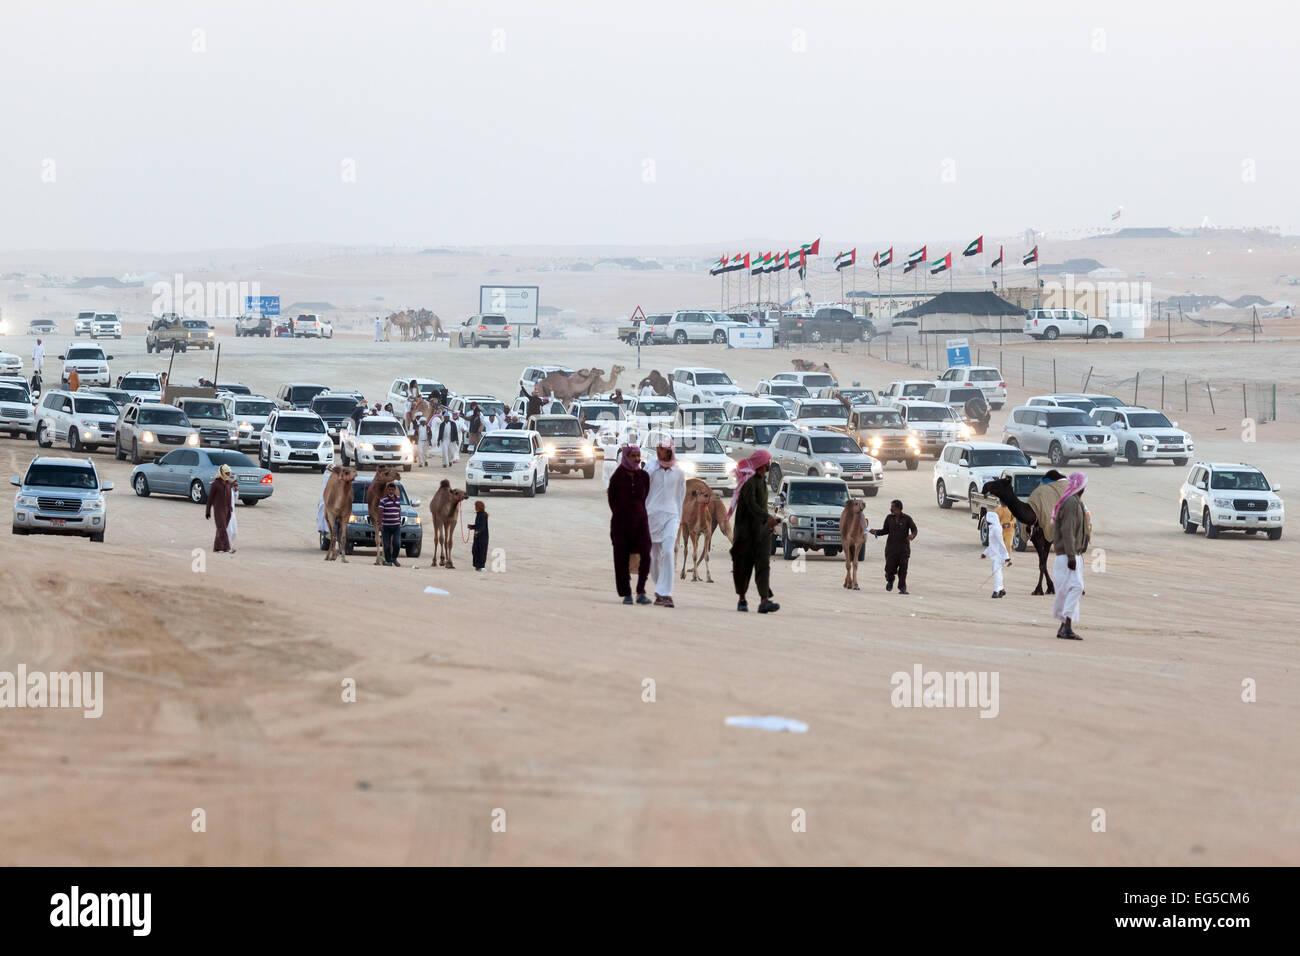 Emirati people in their cars at Al Dhafra Camel Festival in Al Gharbia. Stock Photo